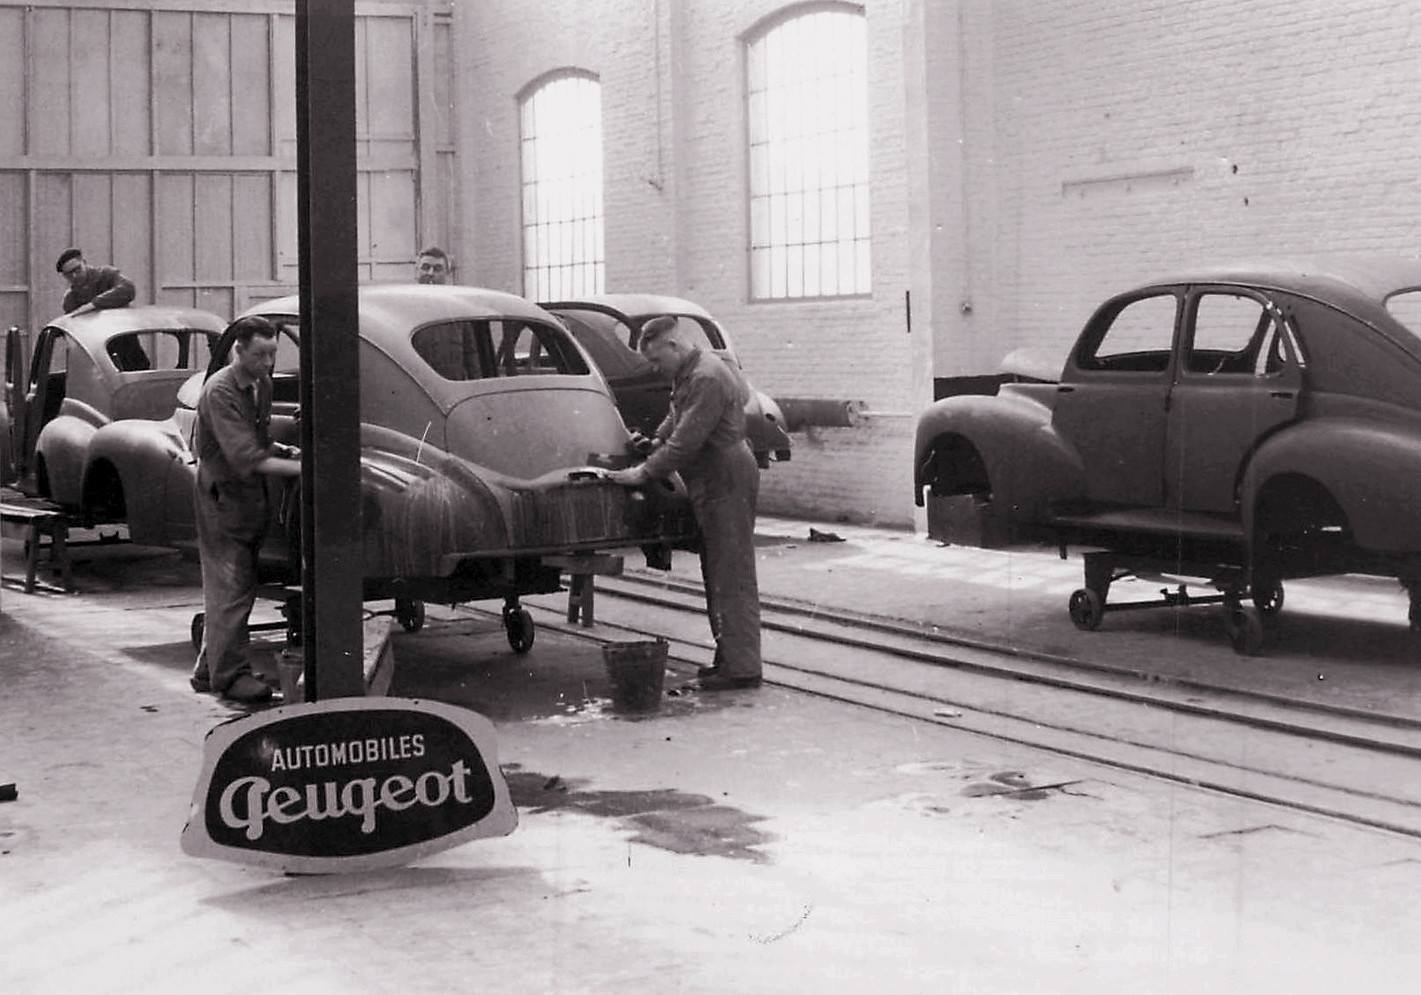 Peugeot-203-jaren-5060